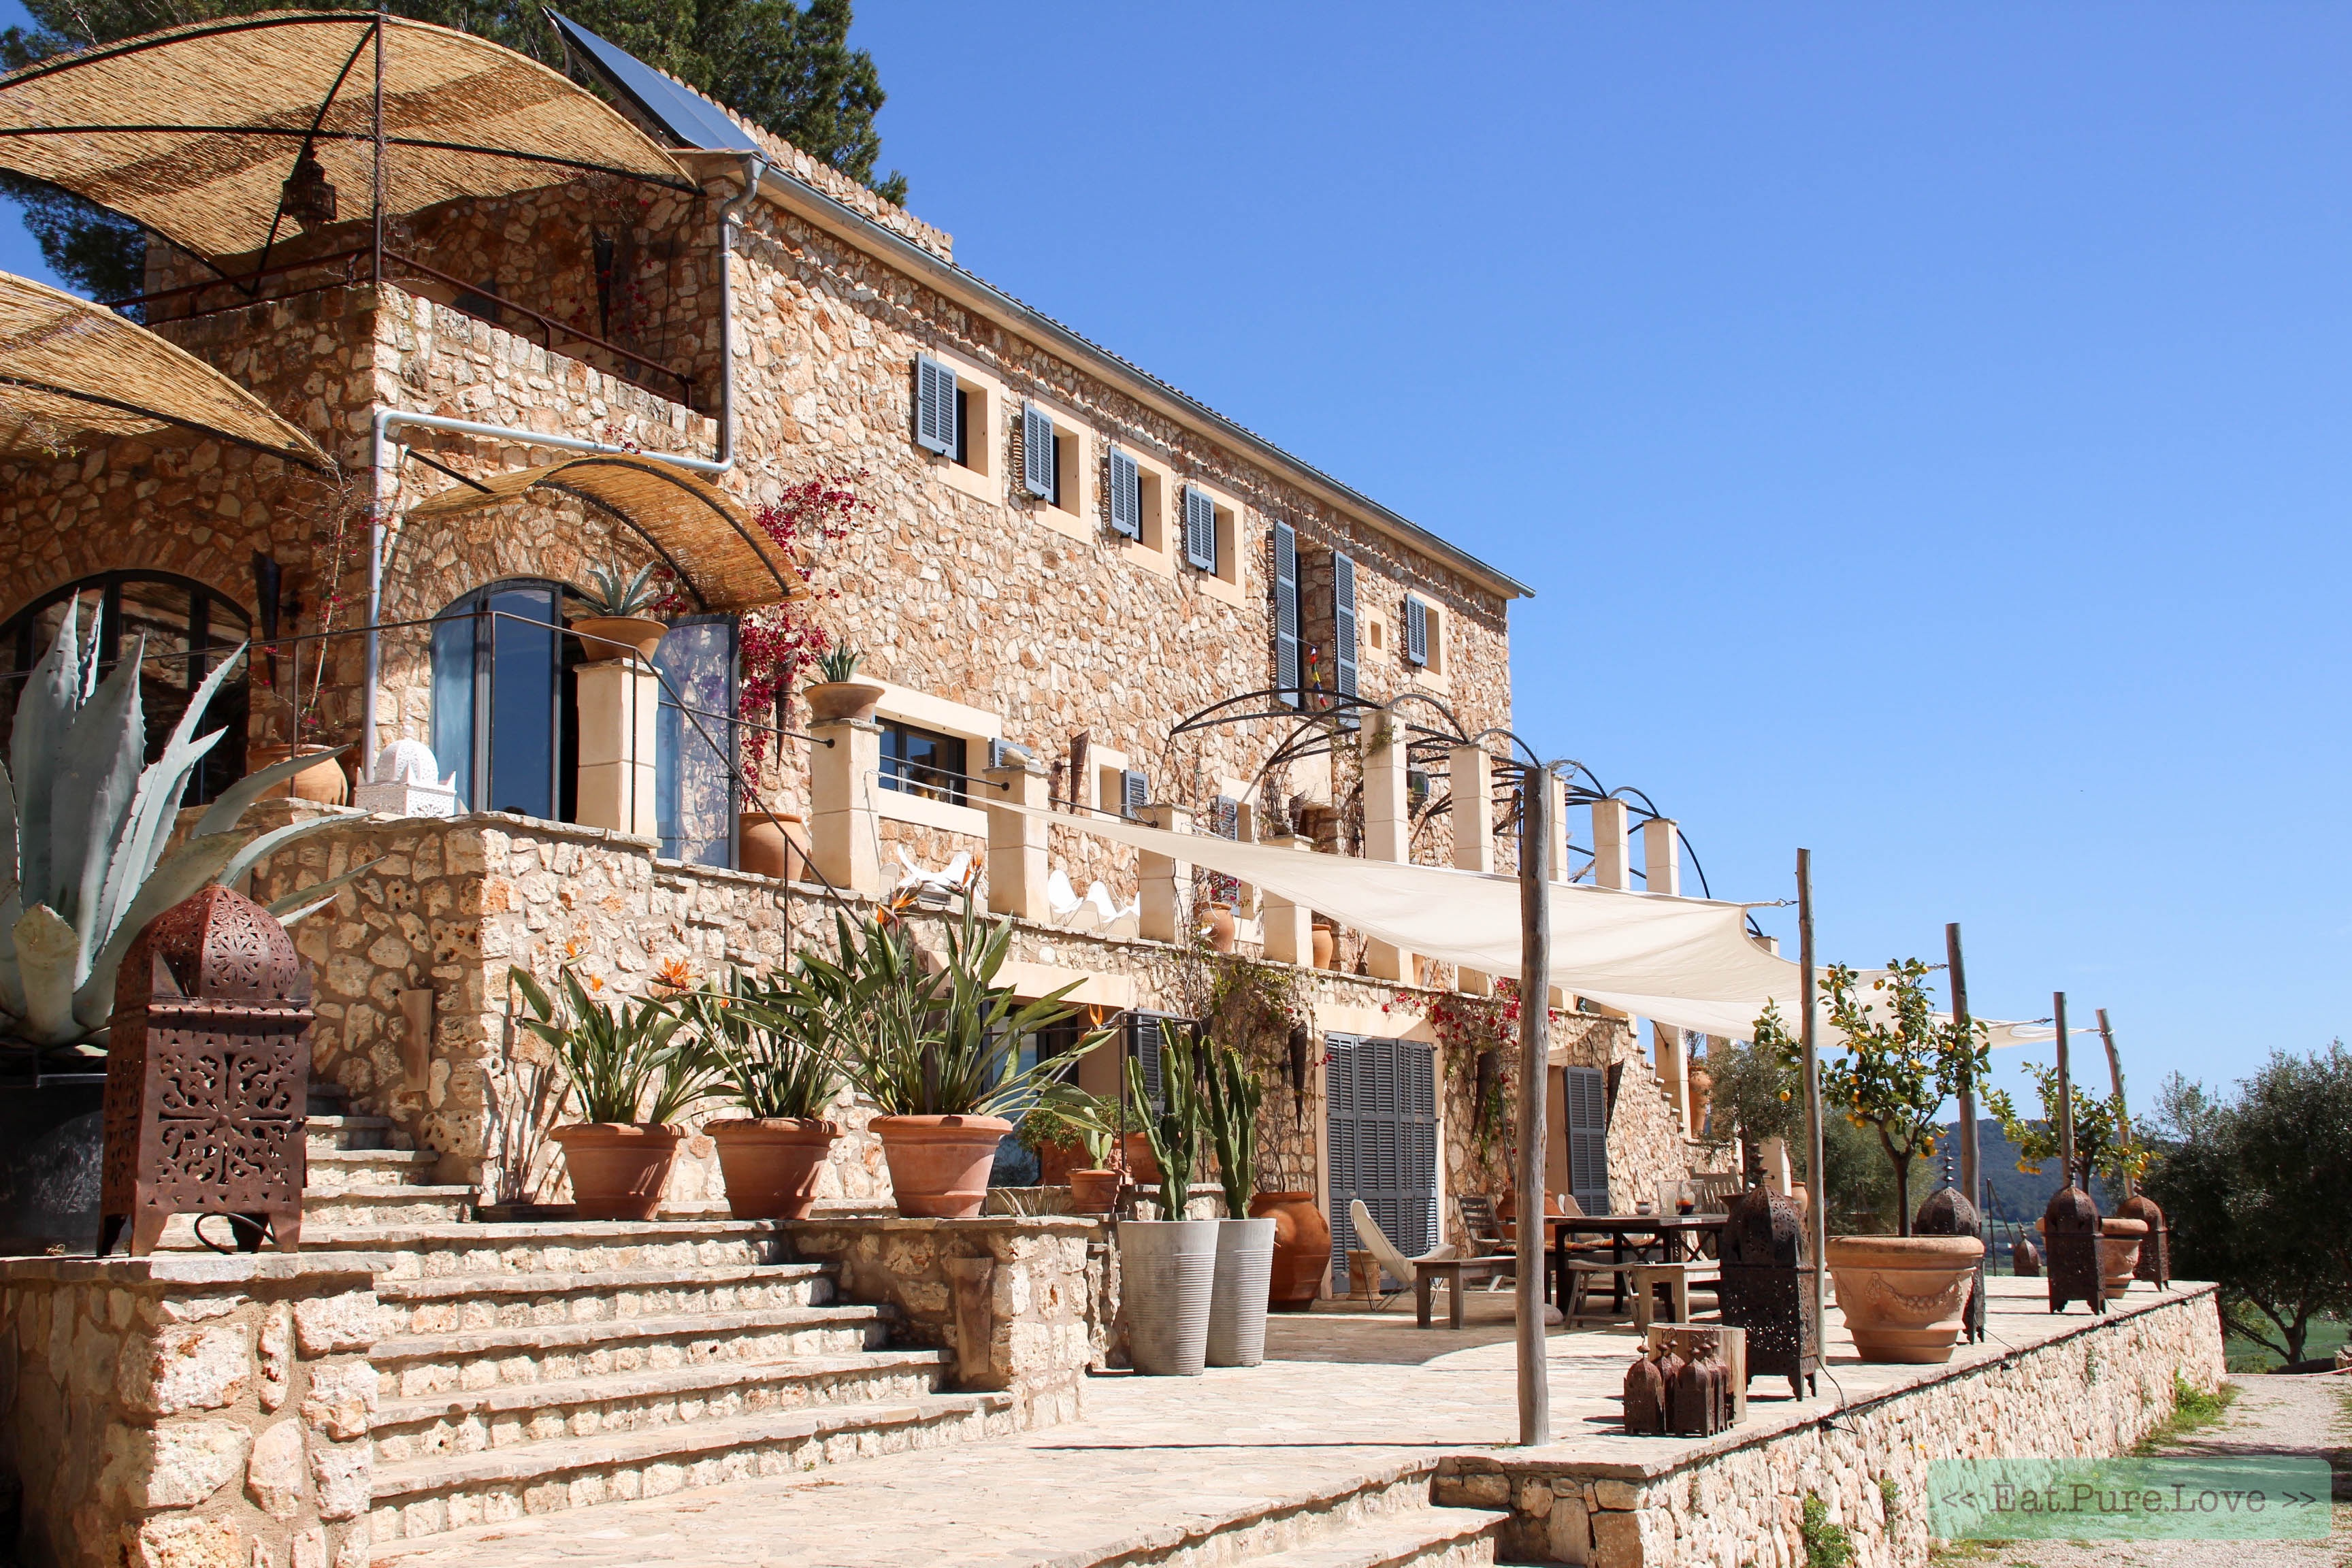 Osa Major: relaxen en opladen in het paradijselijke Mallorca